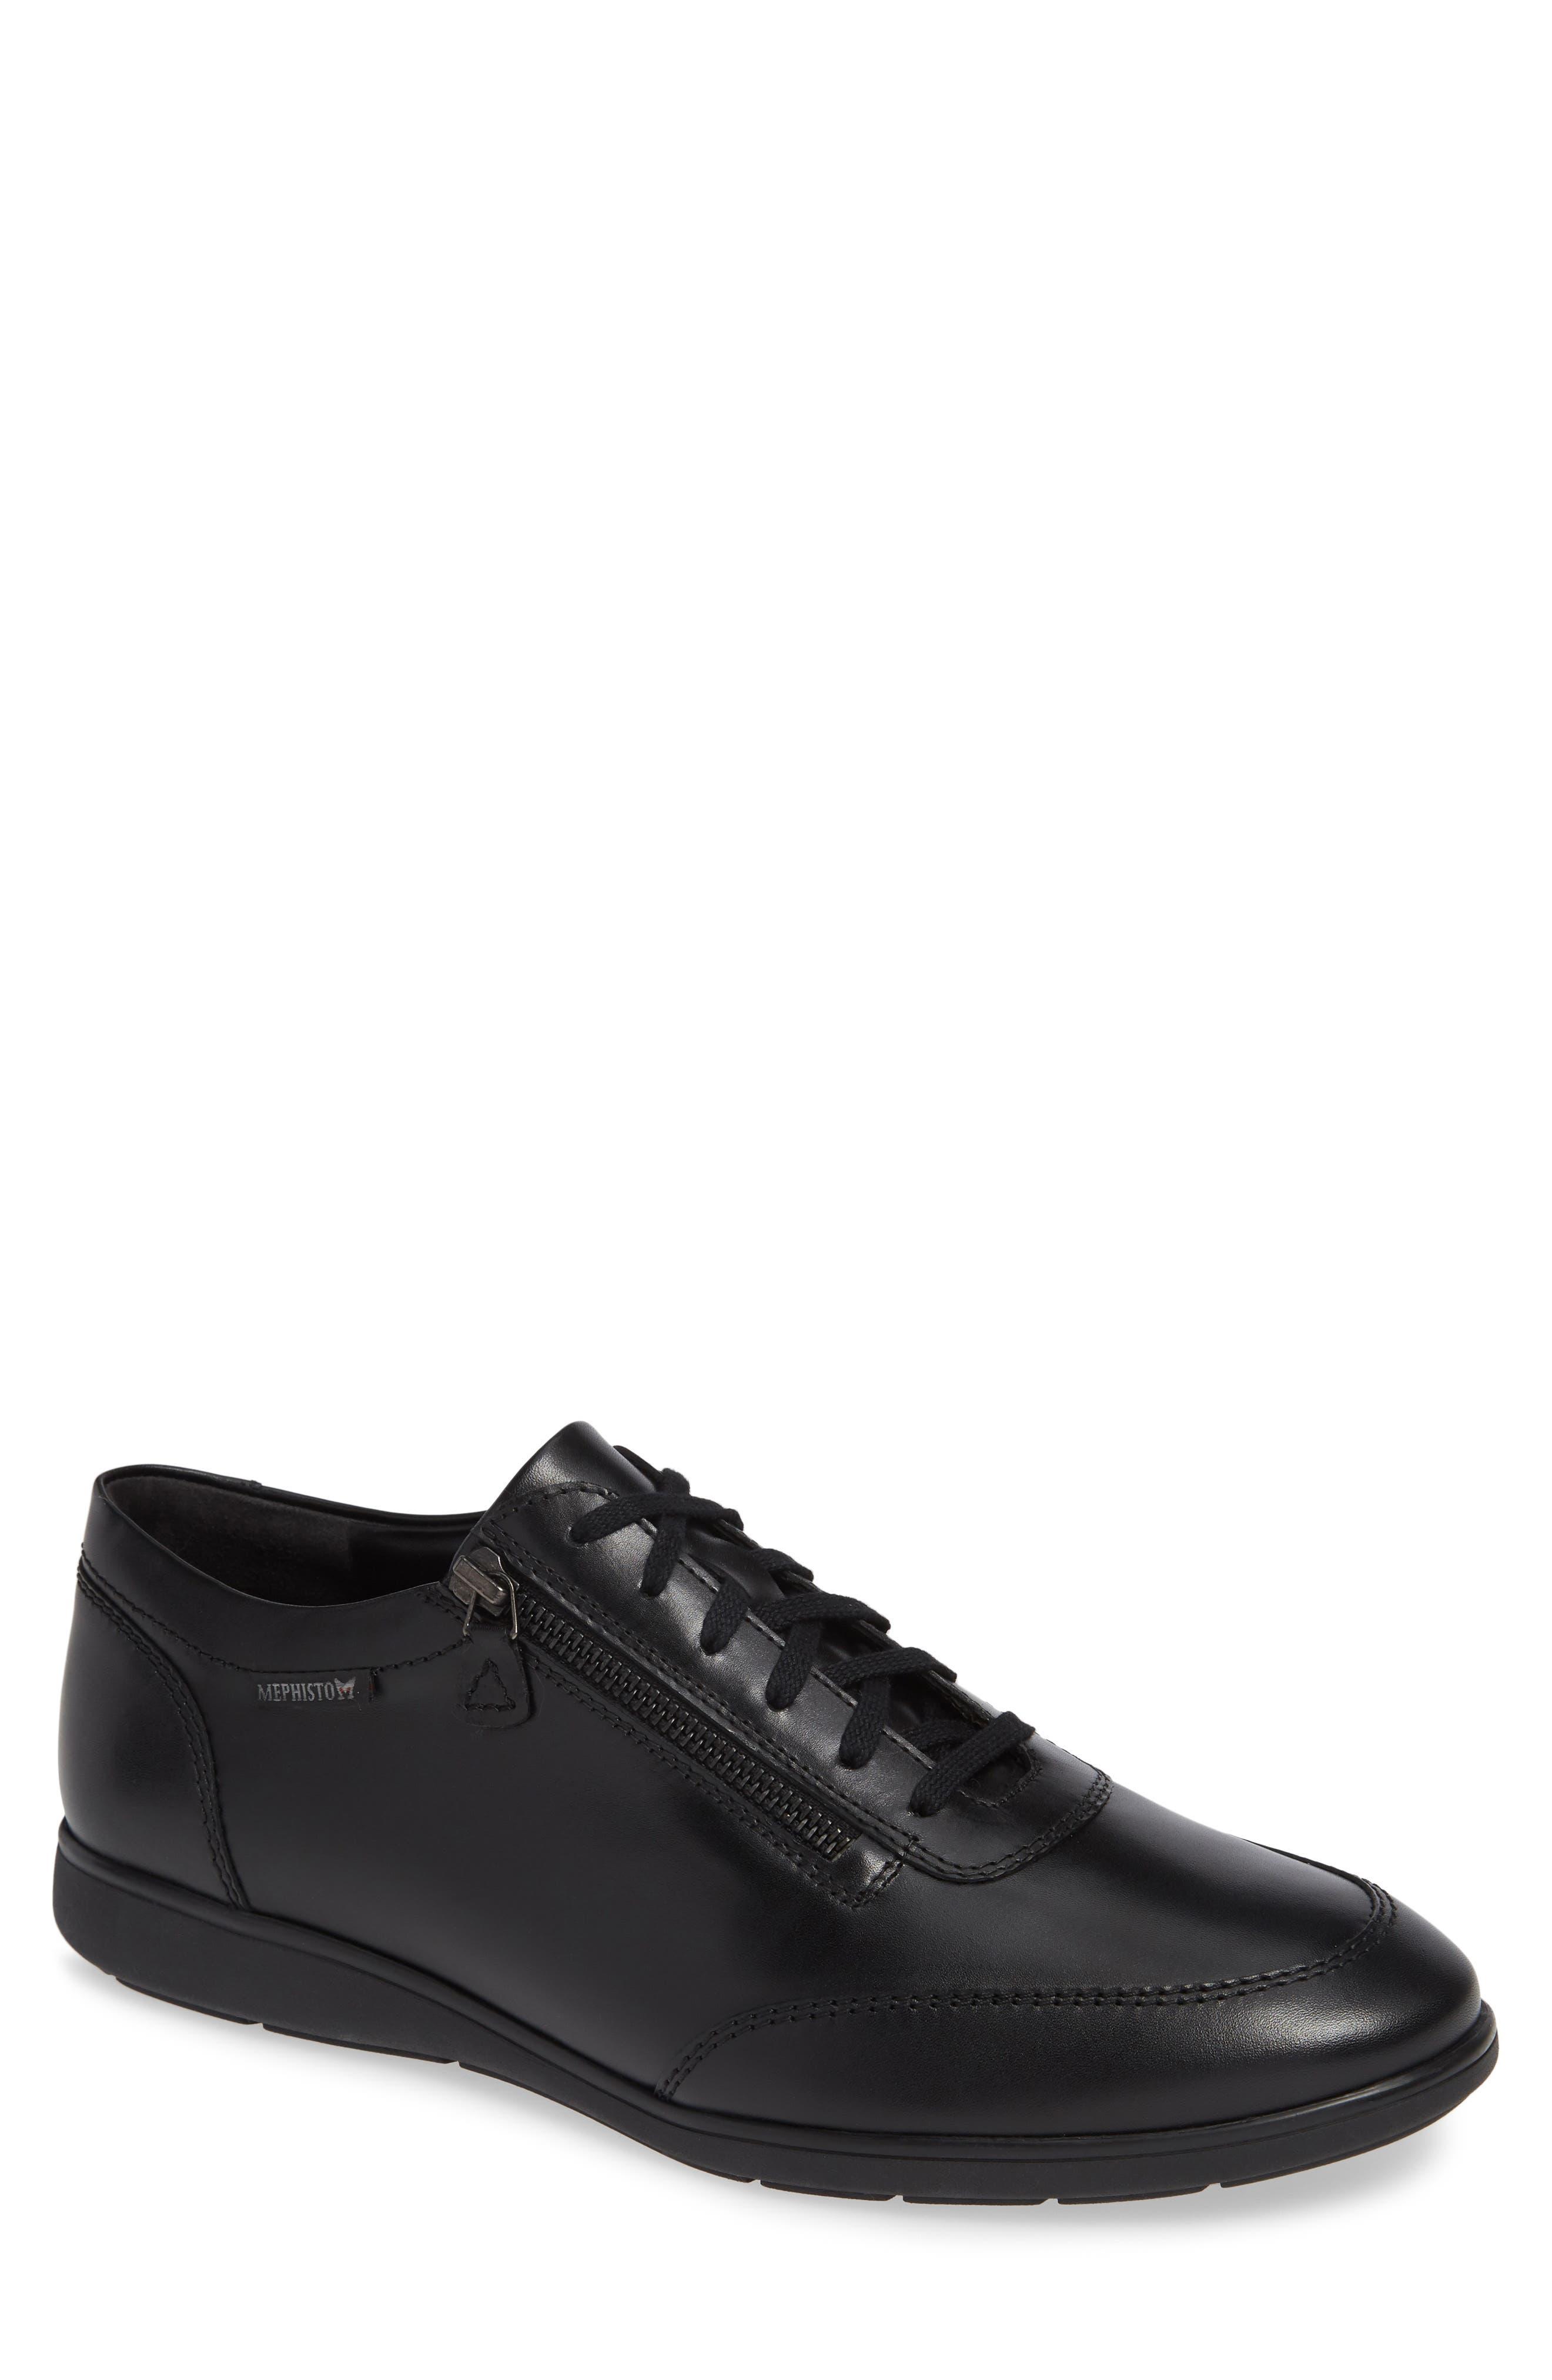 Laurent Zippered Low Top Sneaker,                             Main thumbnail 1, color,                             001